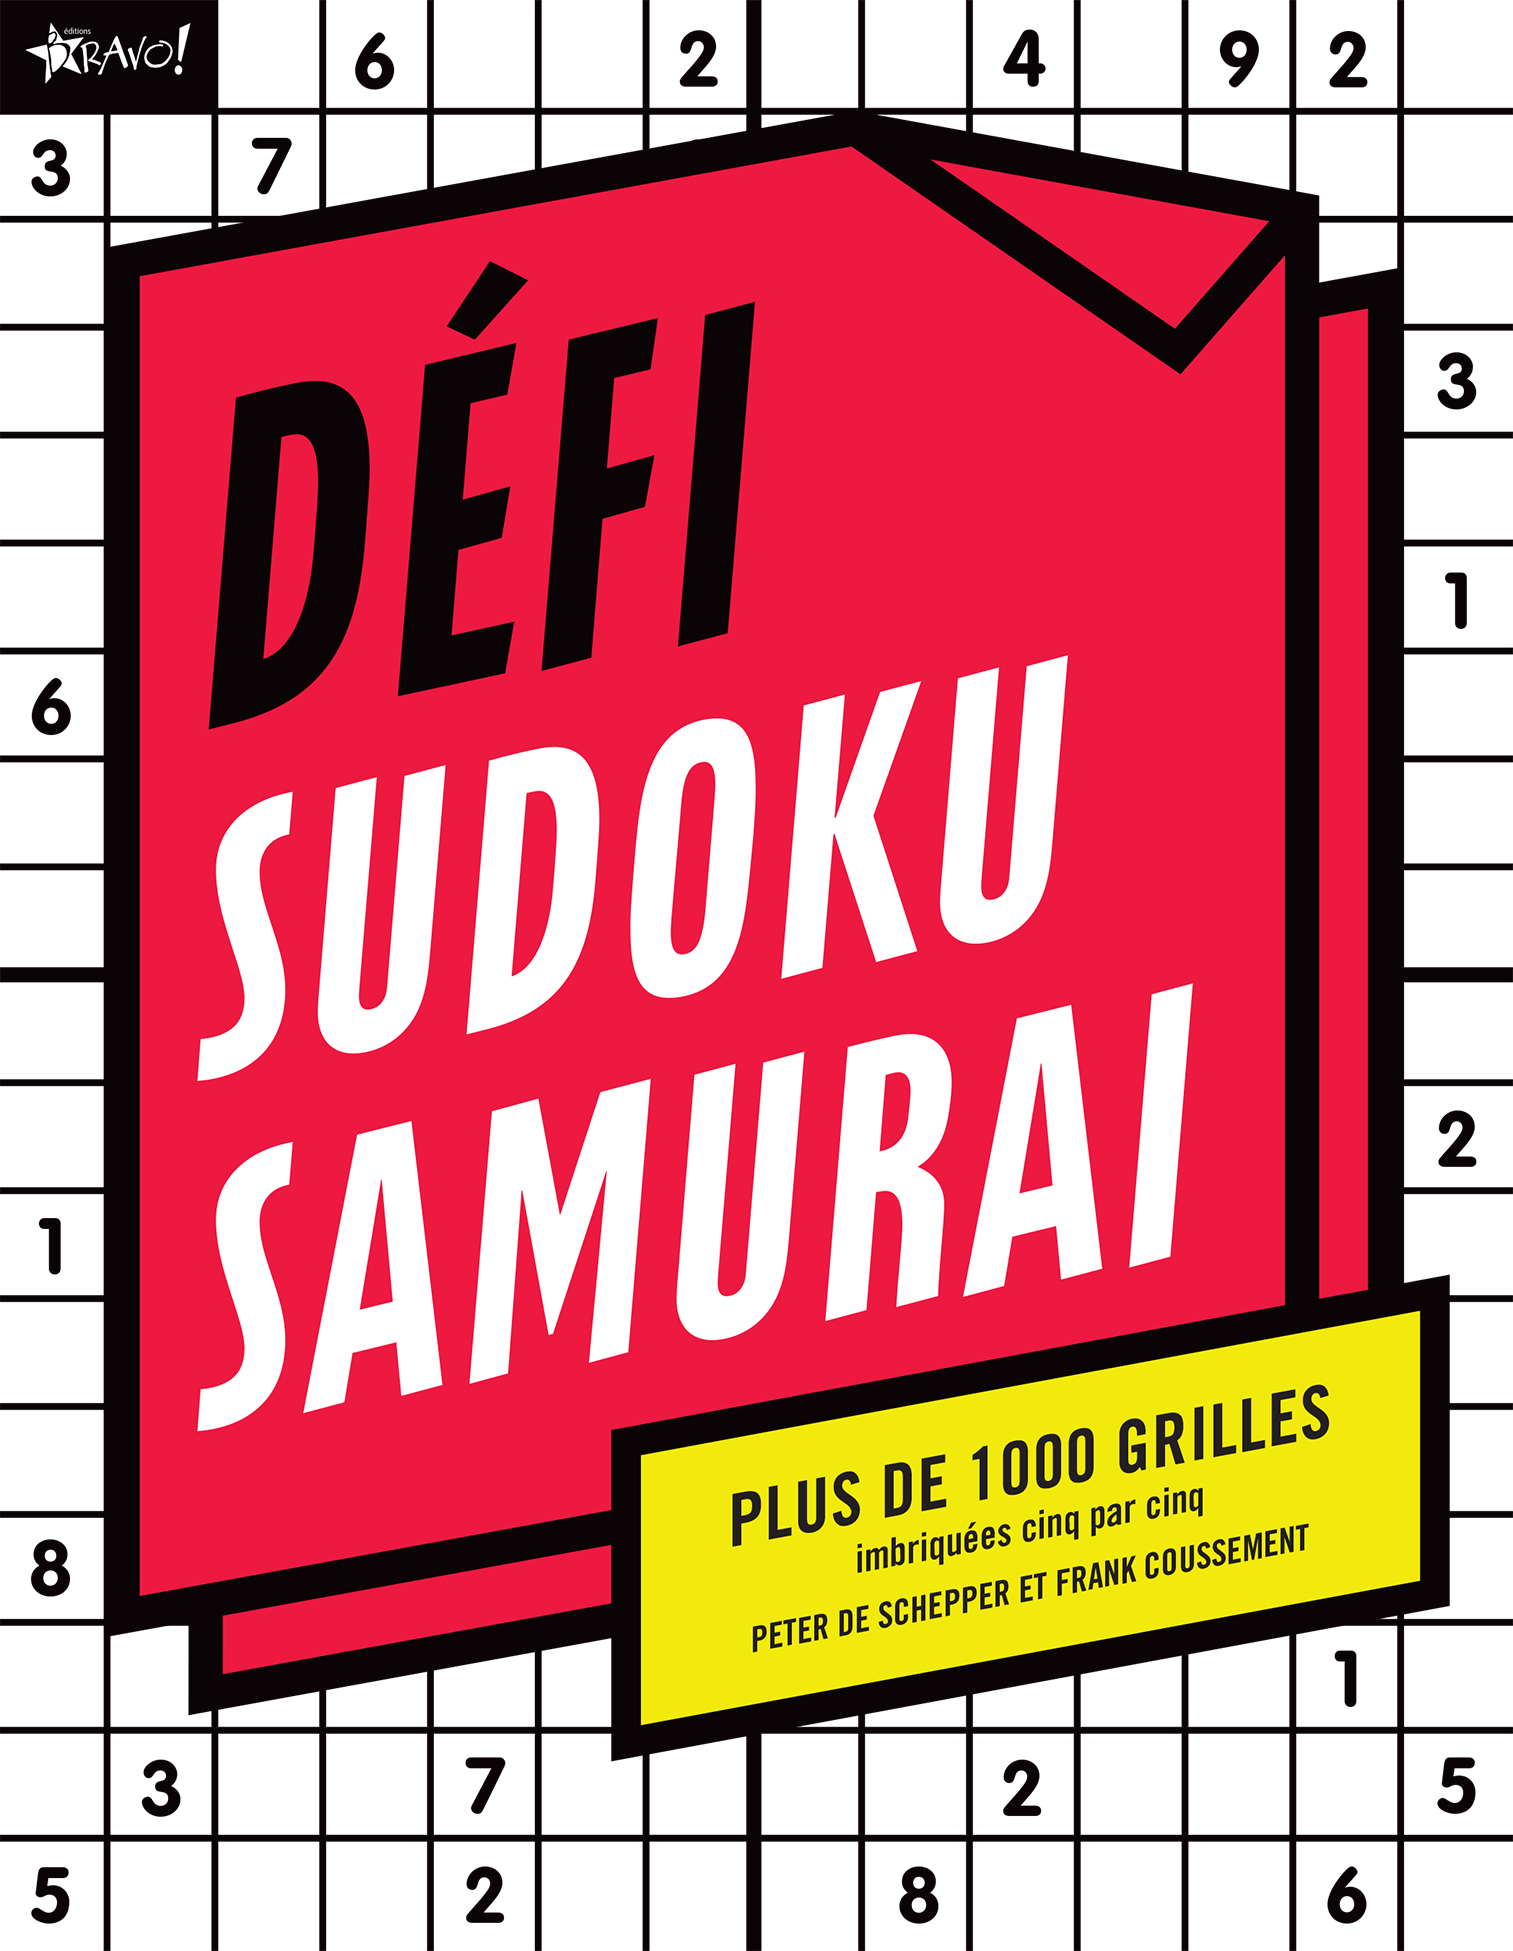 318_DefiSudokuSamourai_C1